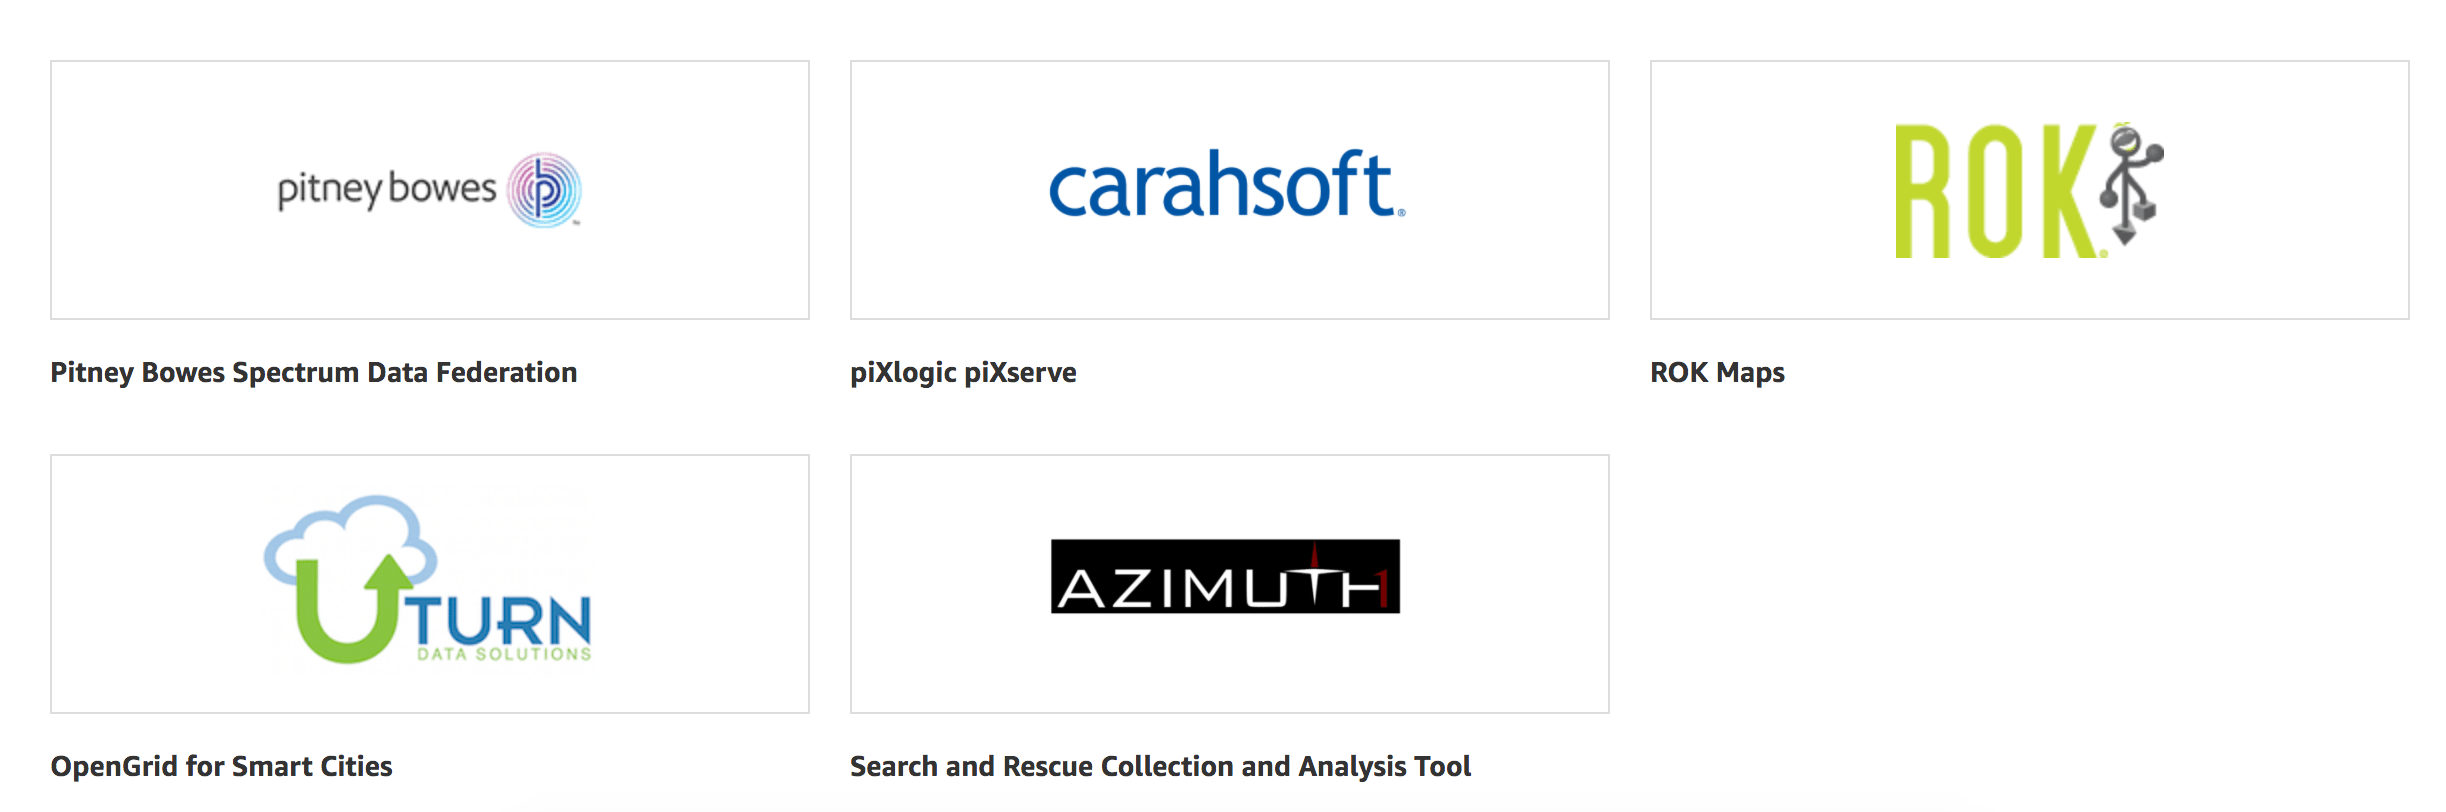 Mapping & Visualization software on Amazon AWS